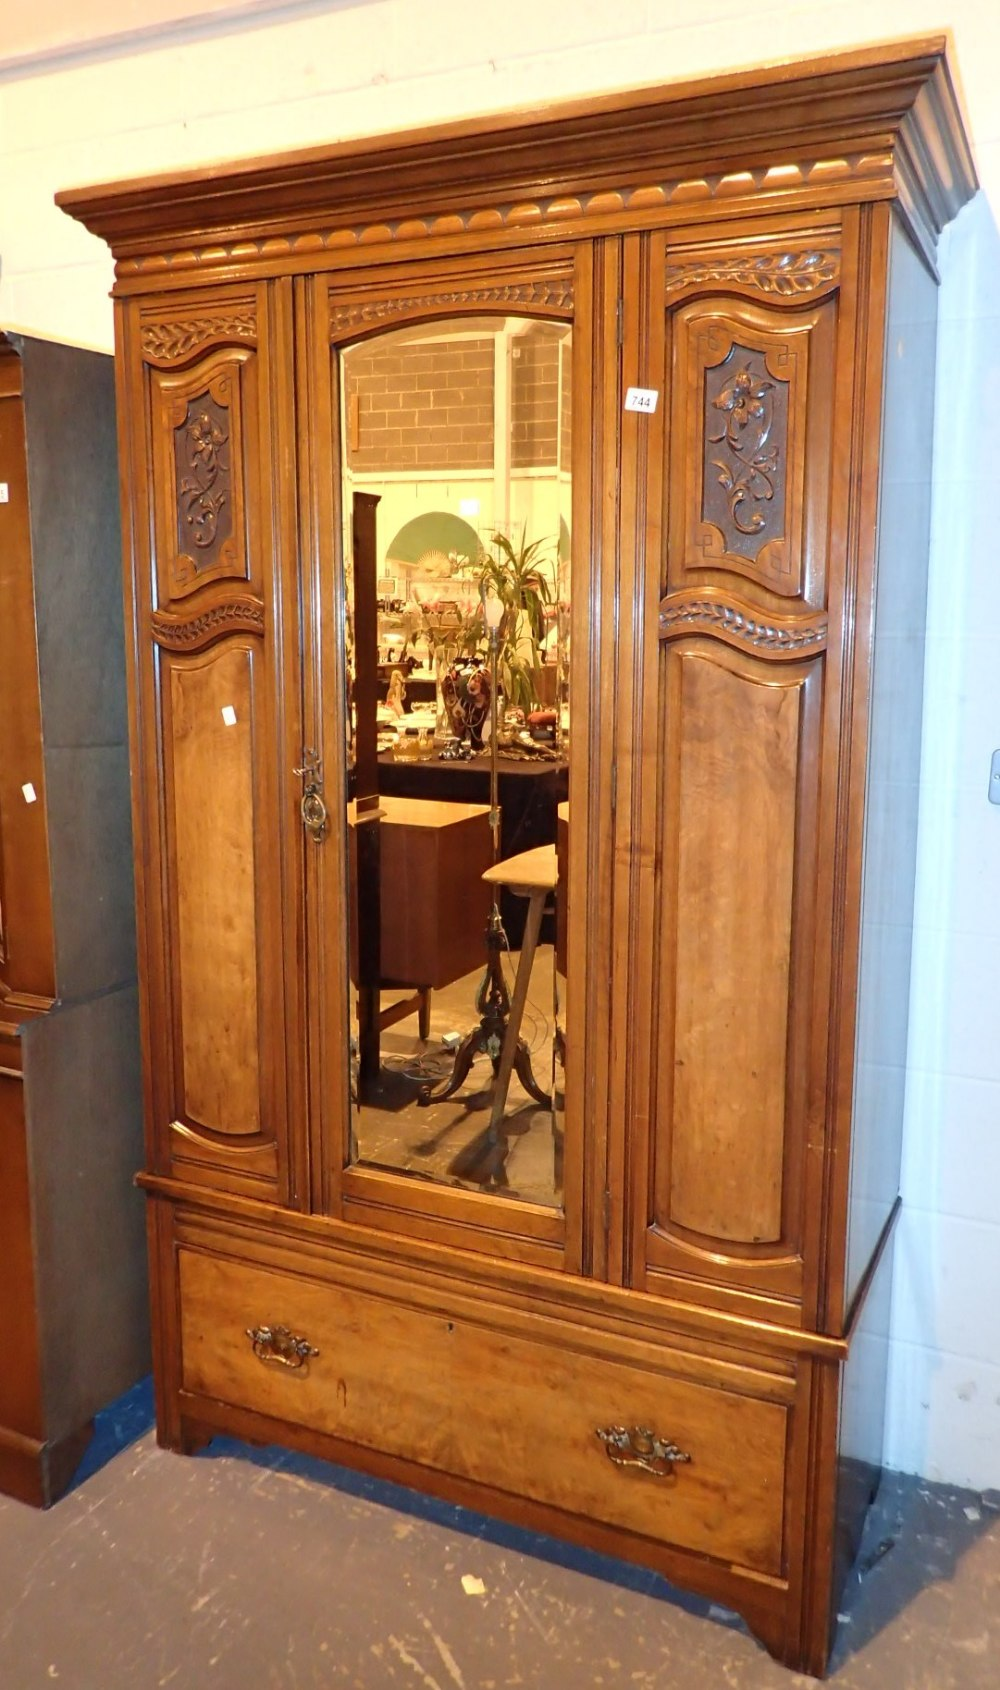 Lot 744 - Large carved walnut mirror door wardrobe 112 x 45 x 200 cm H